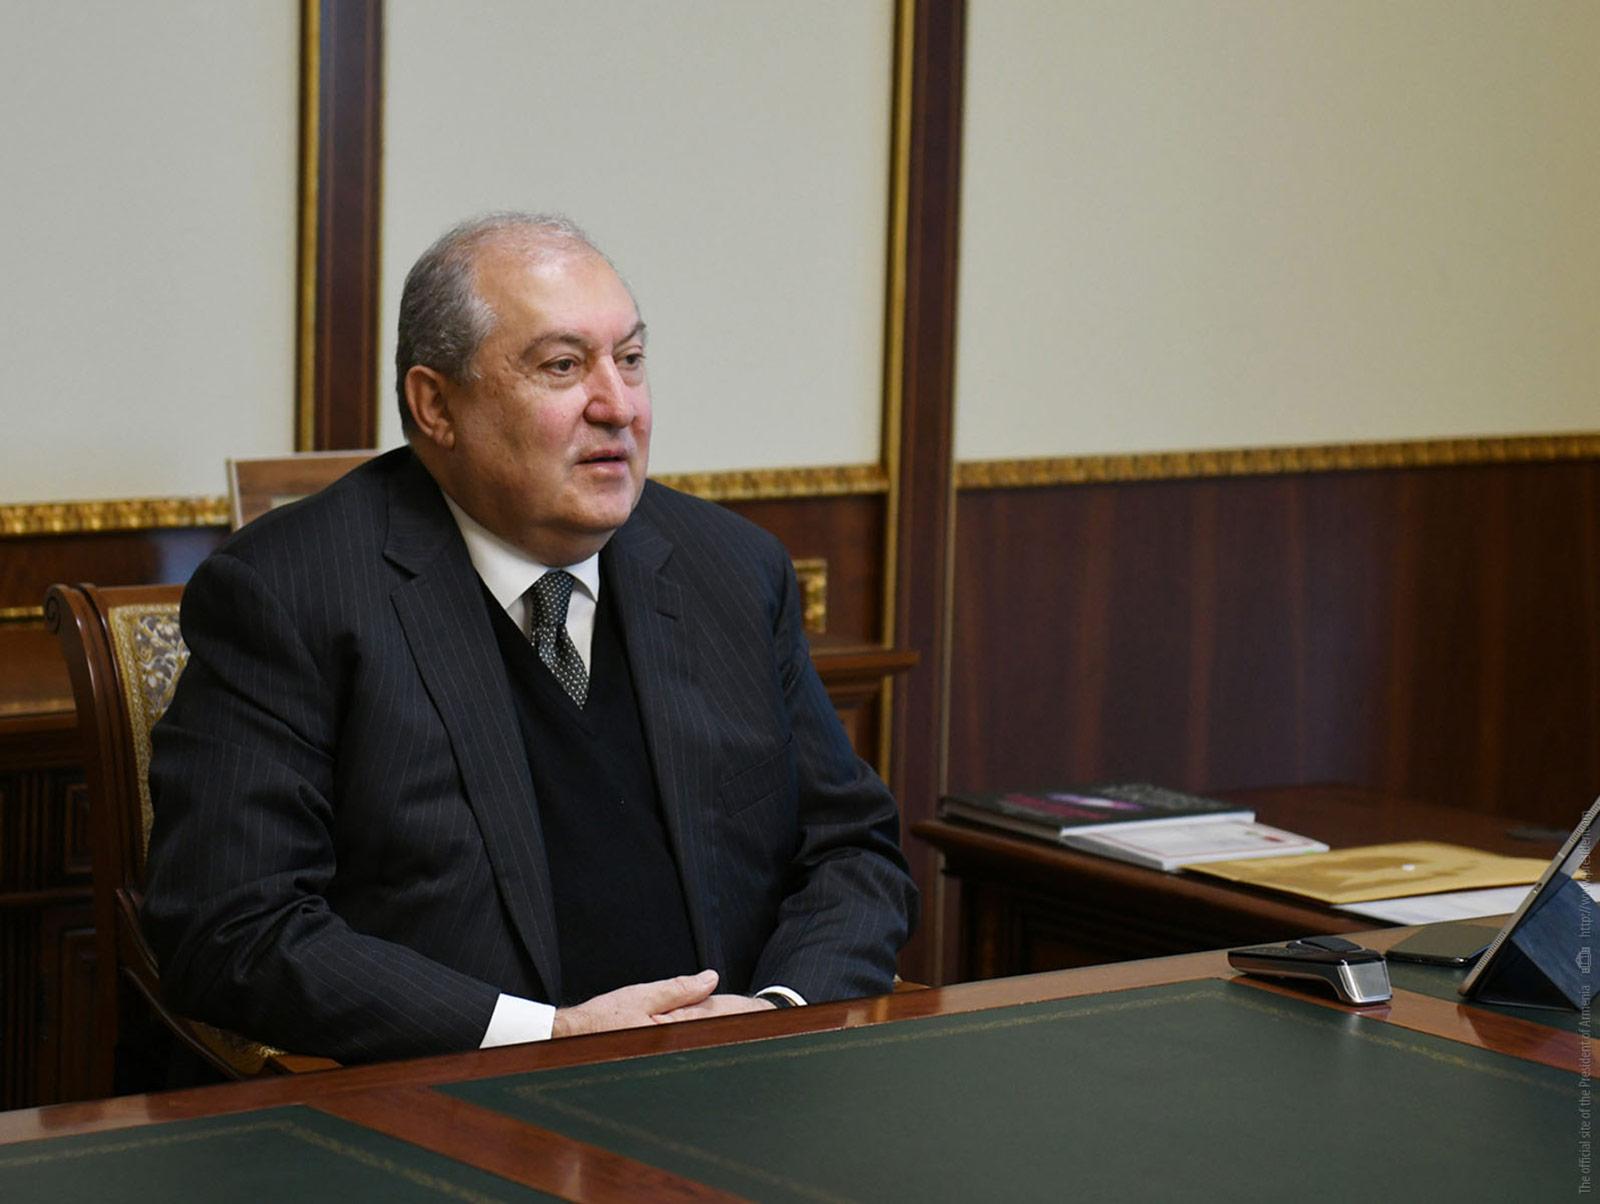 Armenian President Armen Sarkissian attends a meeting in March 2020.